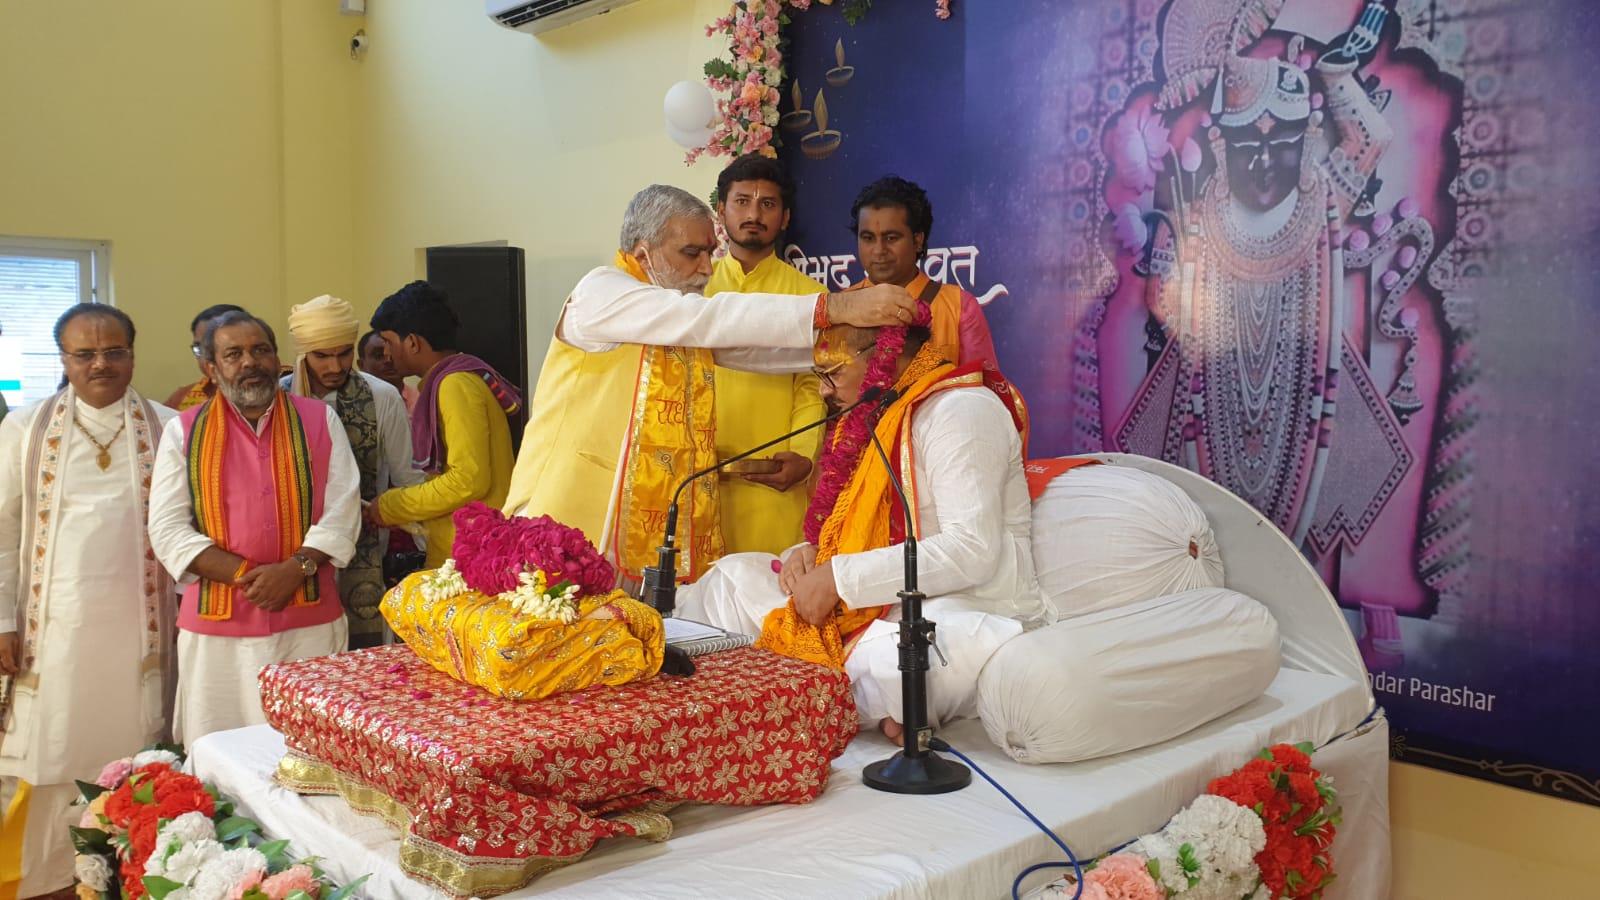 केंद्रीय मंत्री अश्वनी चौबे ने गुप्तेश्वर पांडेय को तिलक लगाकर कथा का शुभारंभ करवाया।